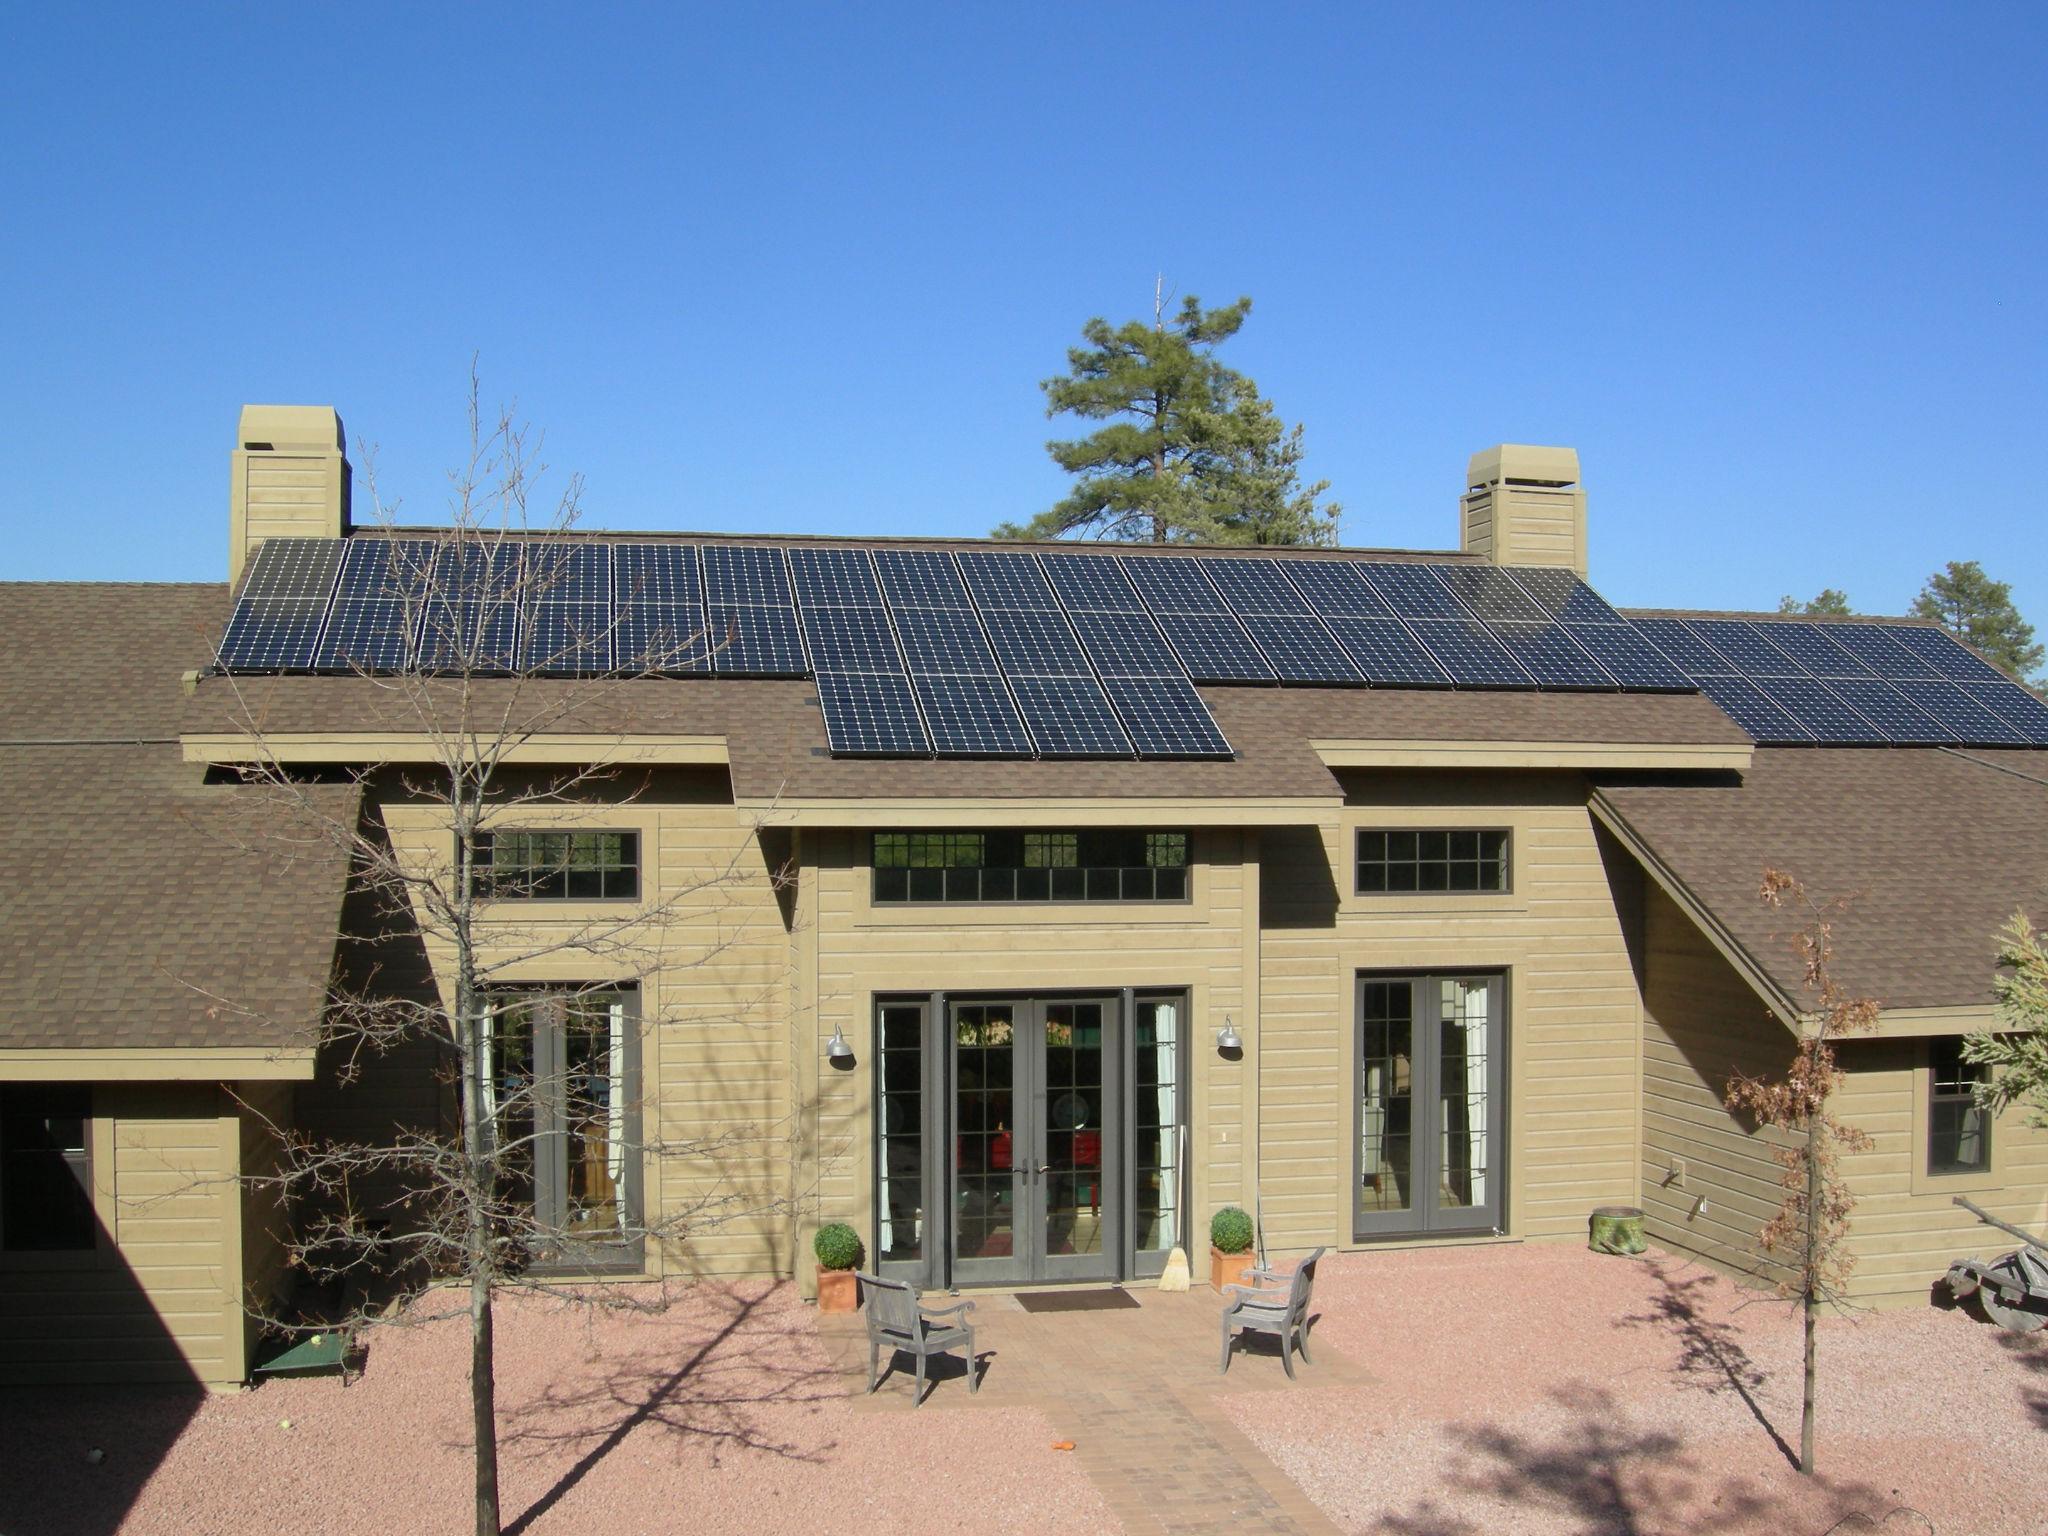 Summerwind Solar Llc Profile Amp Reviews 2018 Energysage